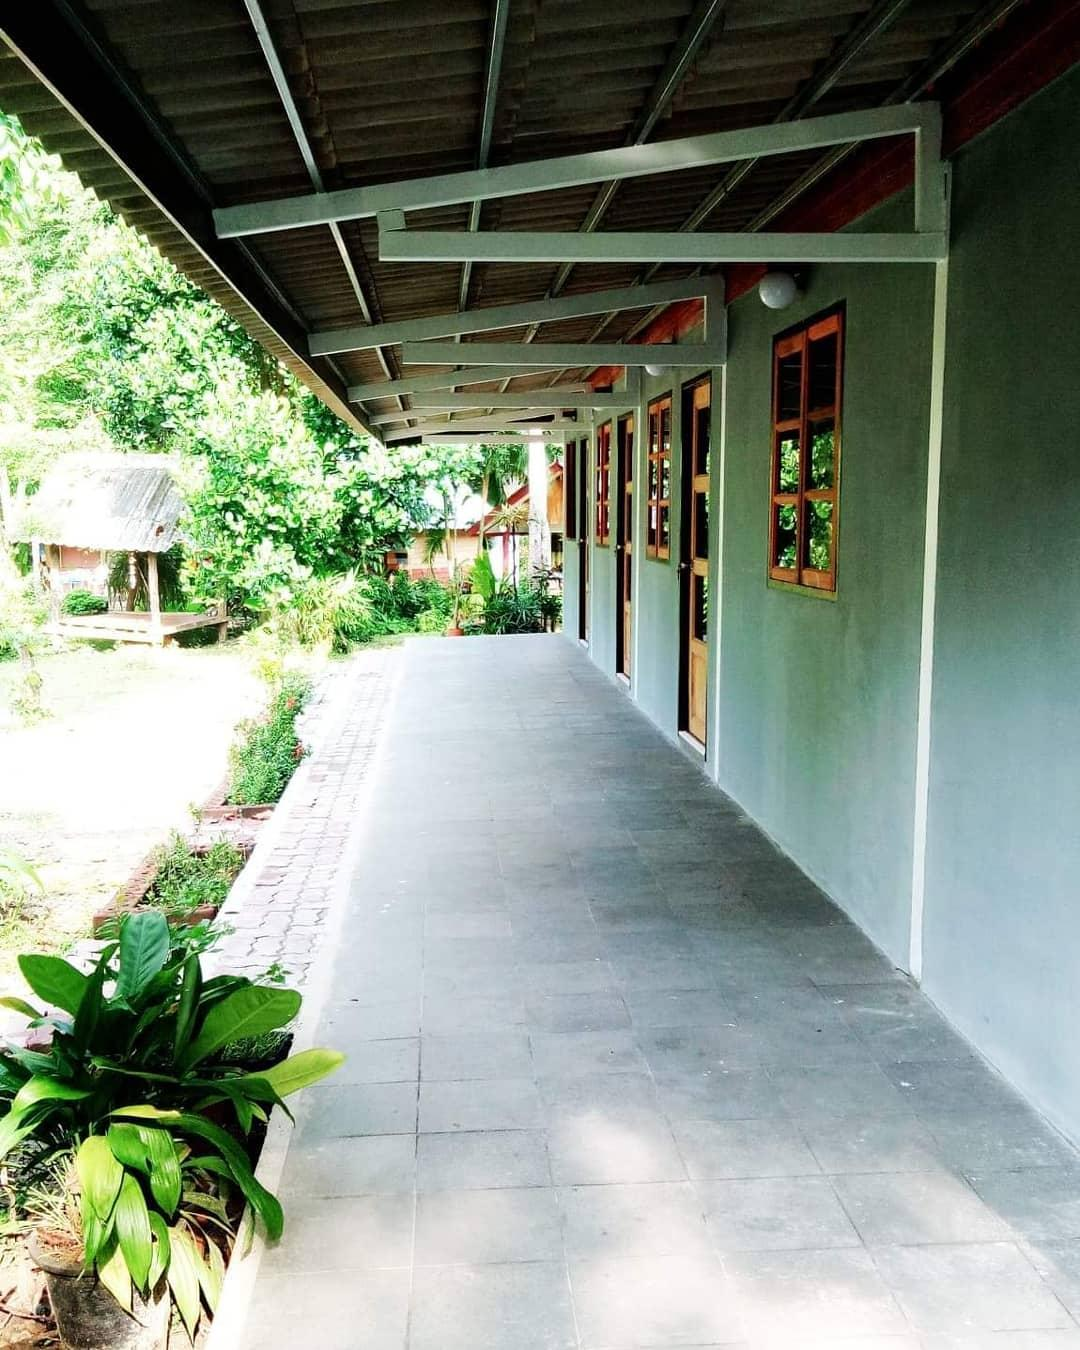 Mayow Bungalow Koh Mook Trang